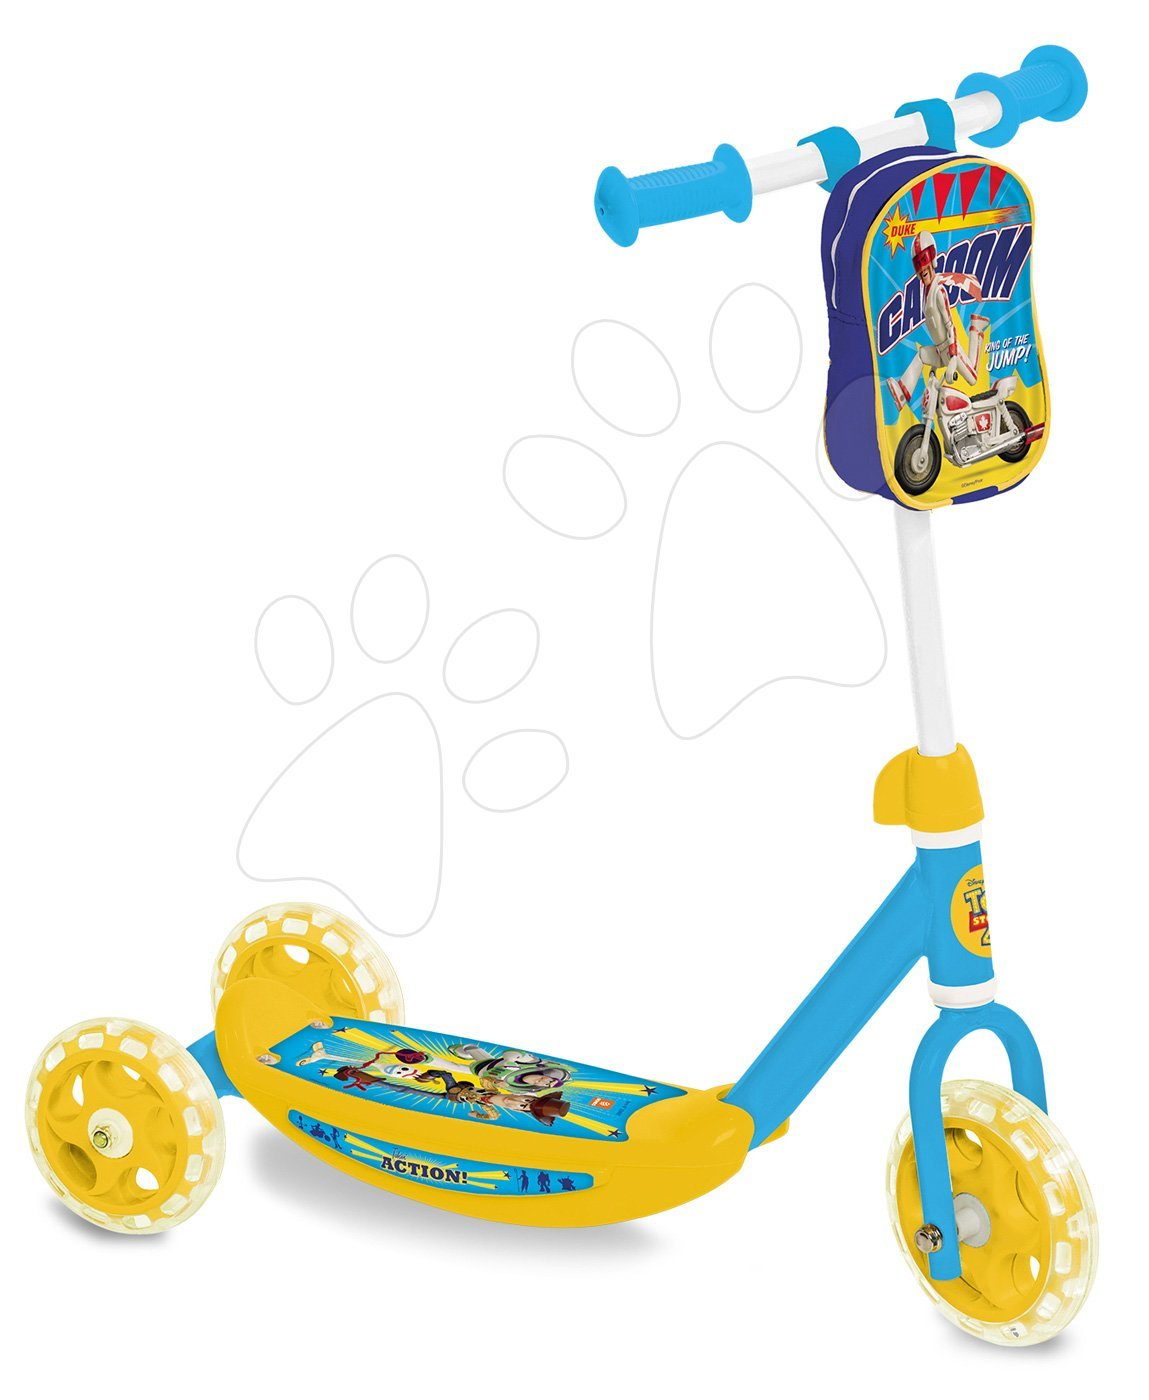 Kolobežka trojkolesová Toy Story Mondo s taštičkou